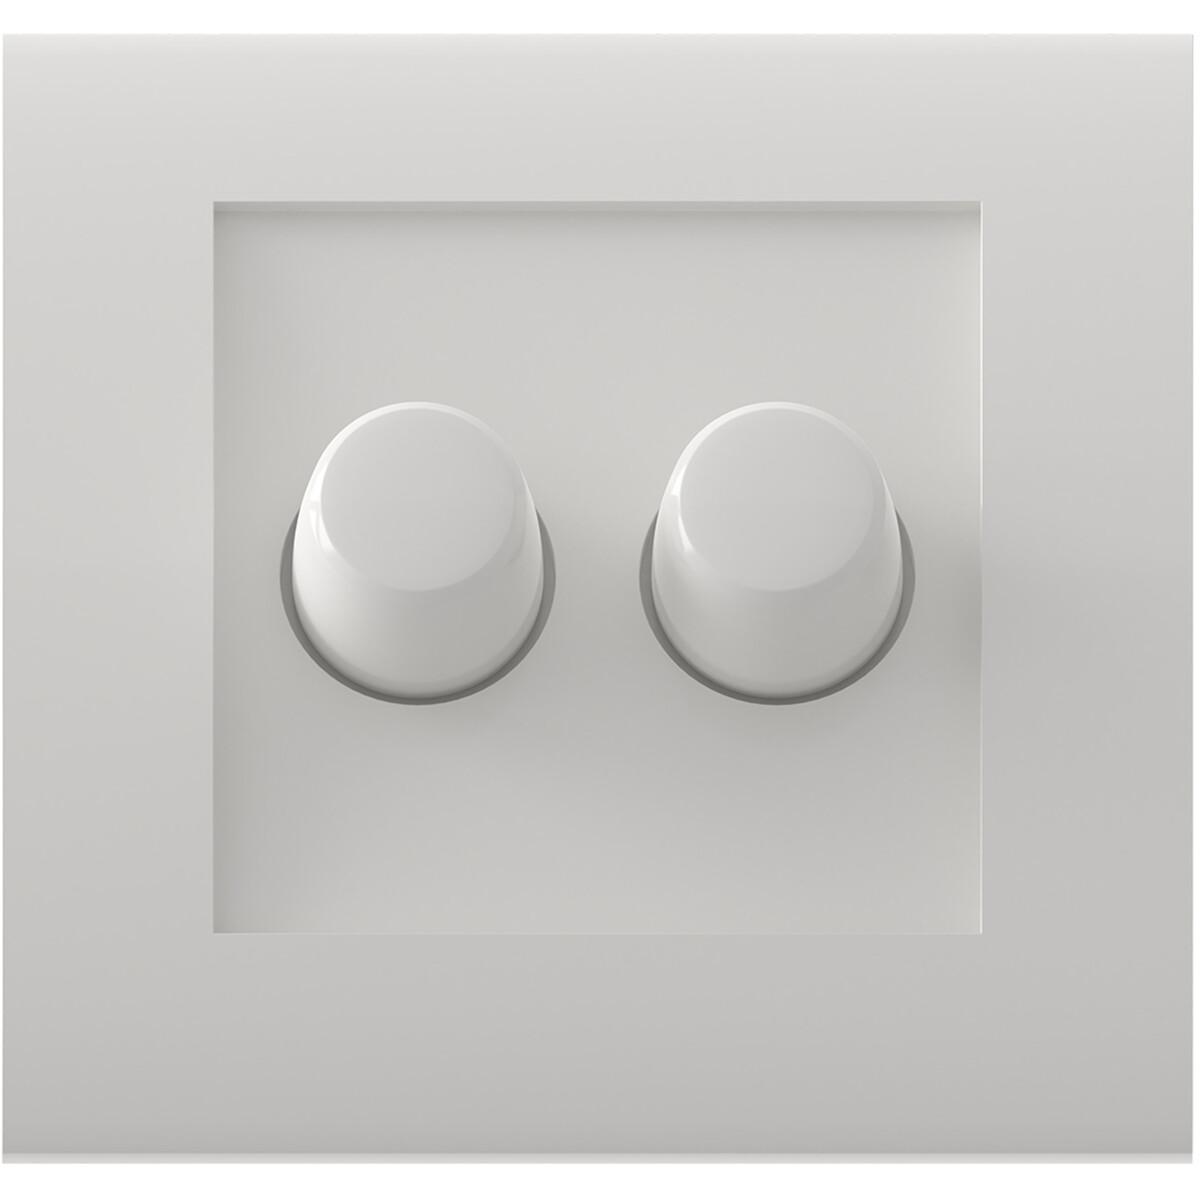 CALEX - Afdekplaat LED DUO Dimmer - Dubbel Knop - Wit